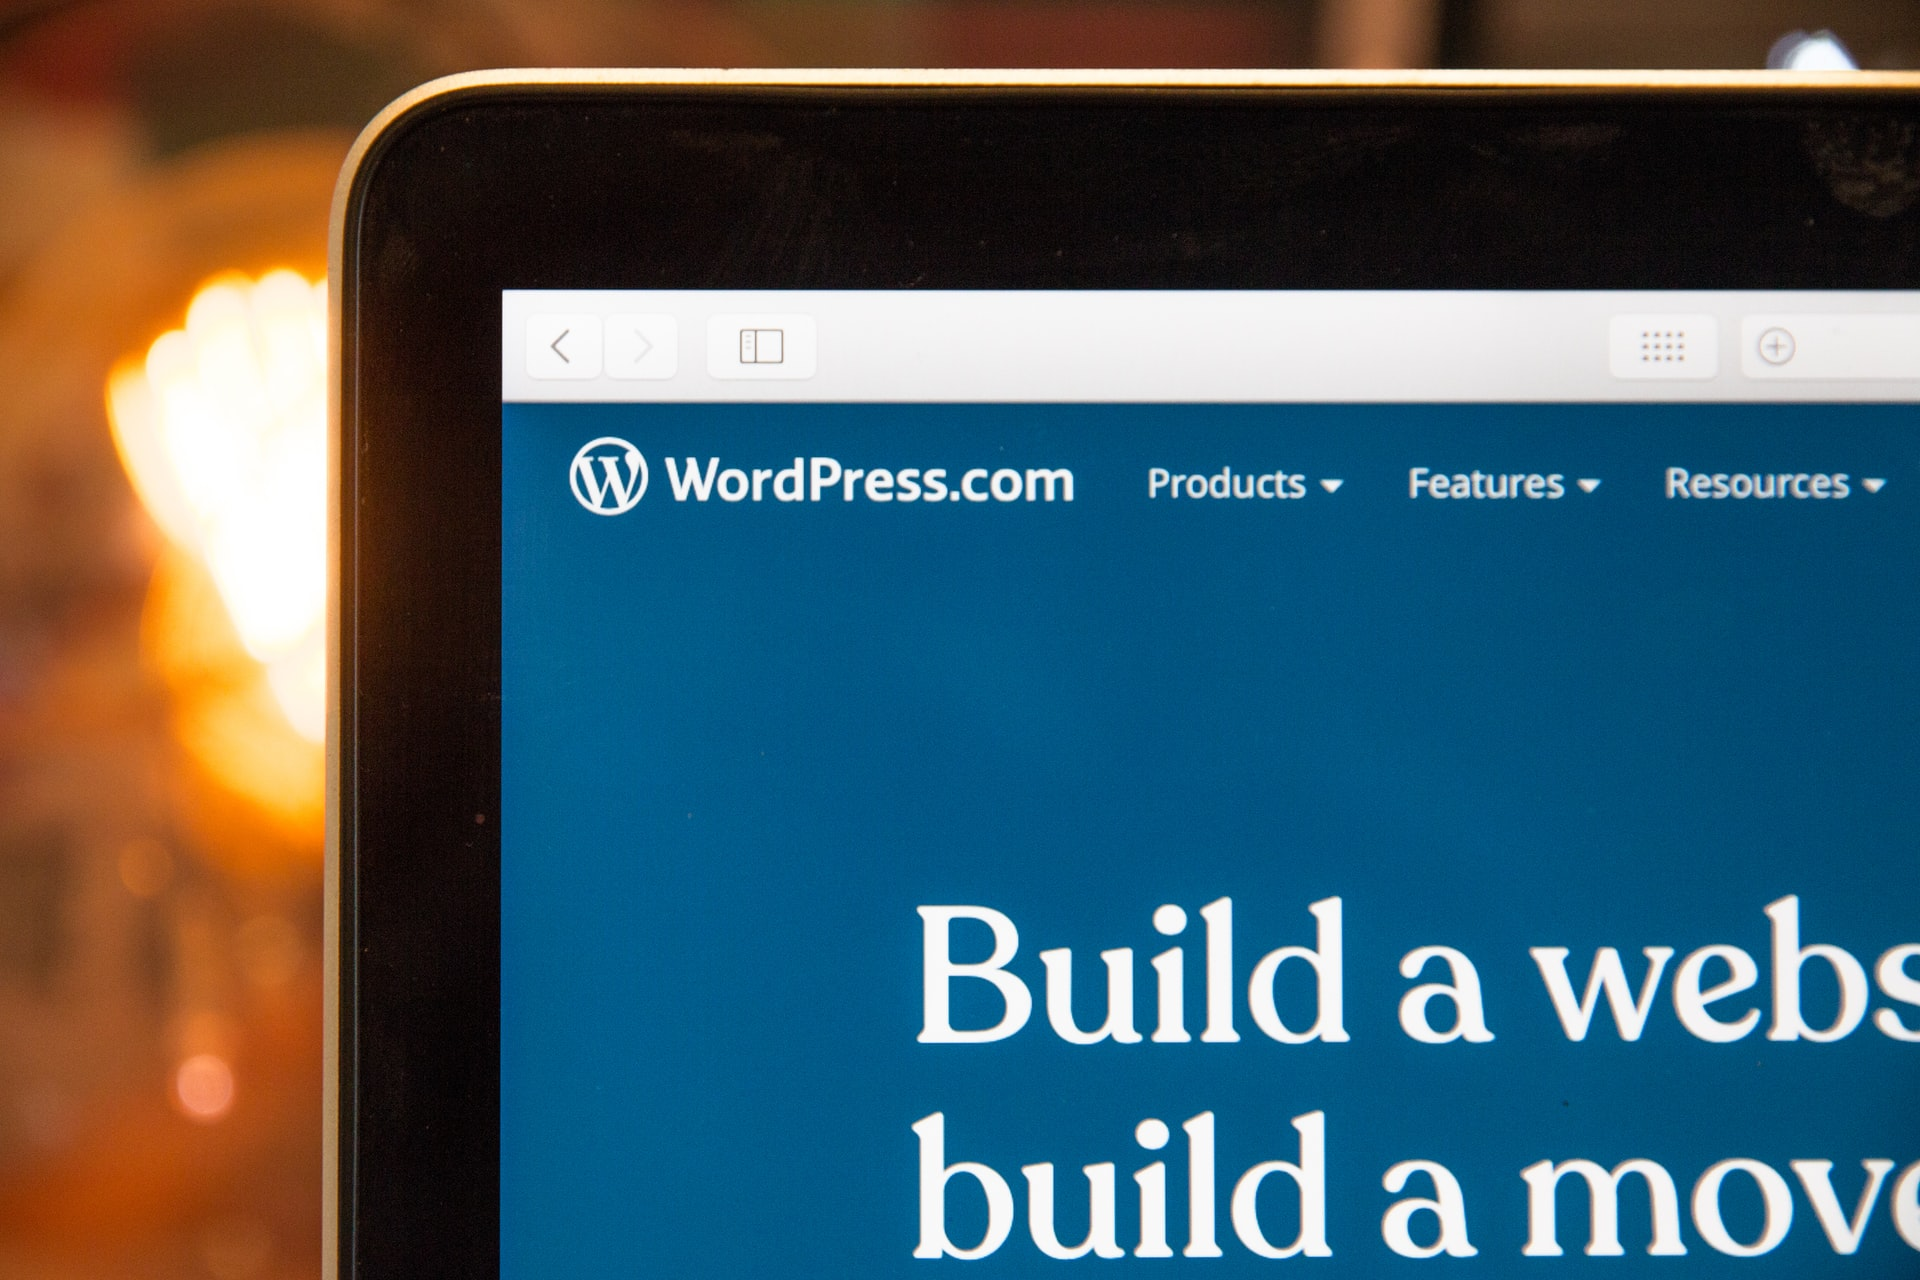 WordPress open in browser